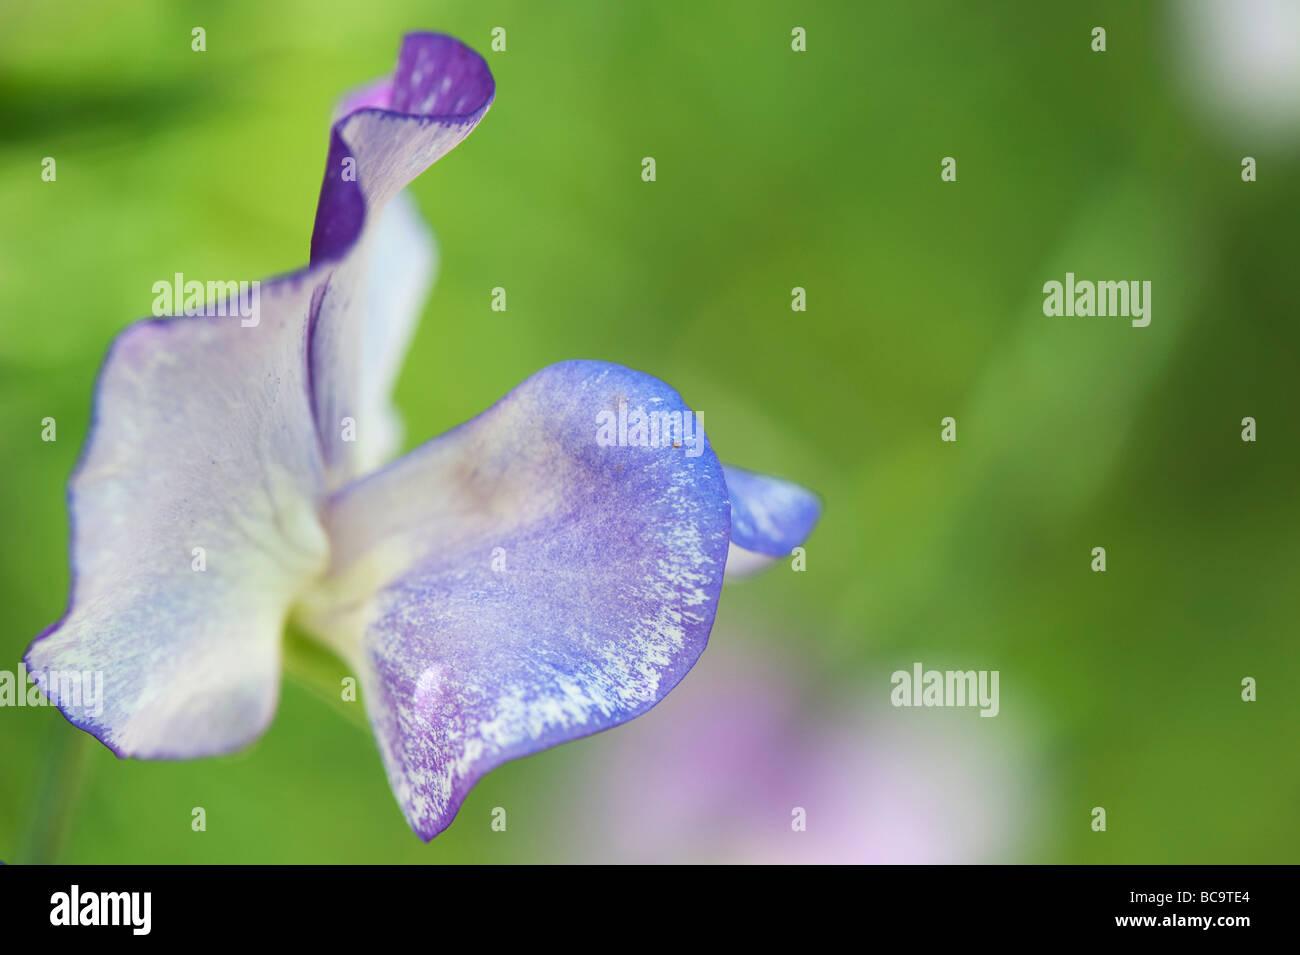 Lathyrus odoratus, Sweet pea 'Blue ripple' flower - Stock Image